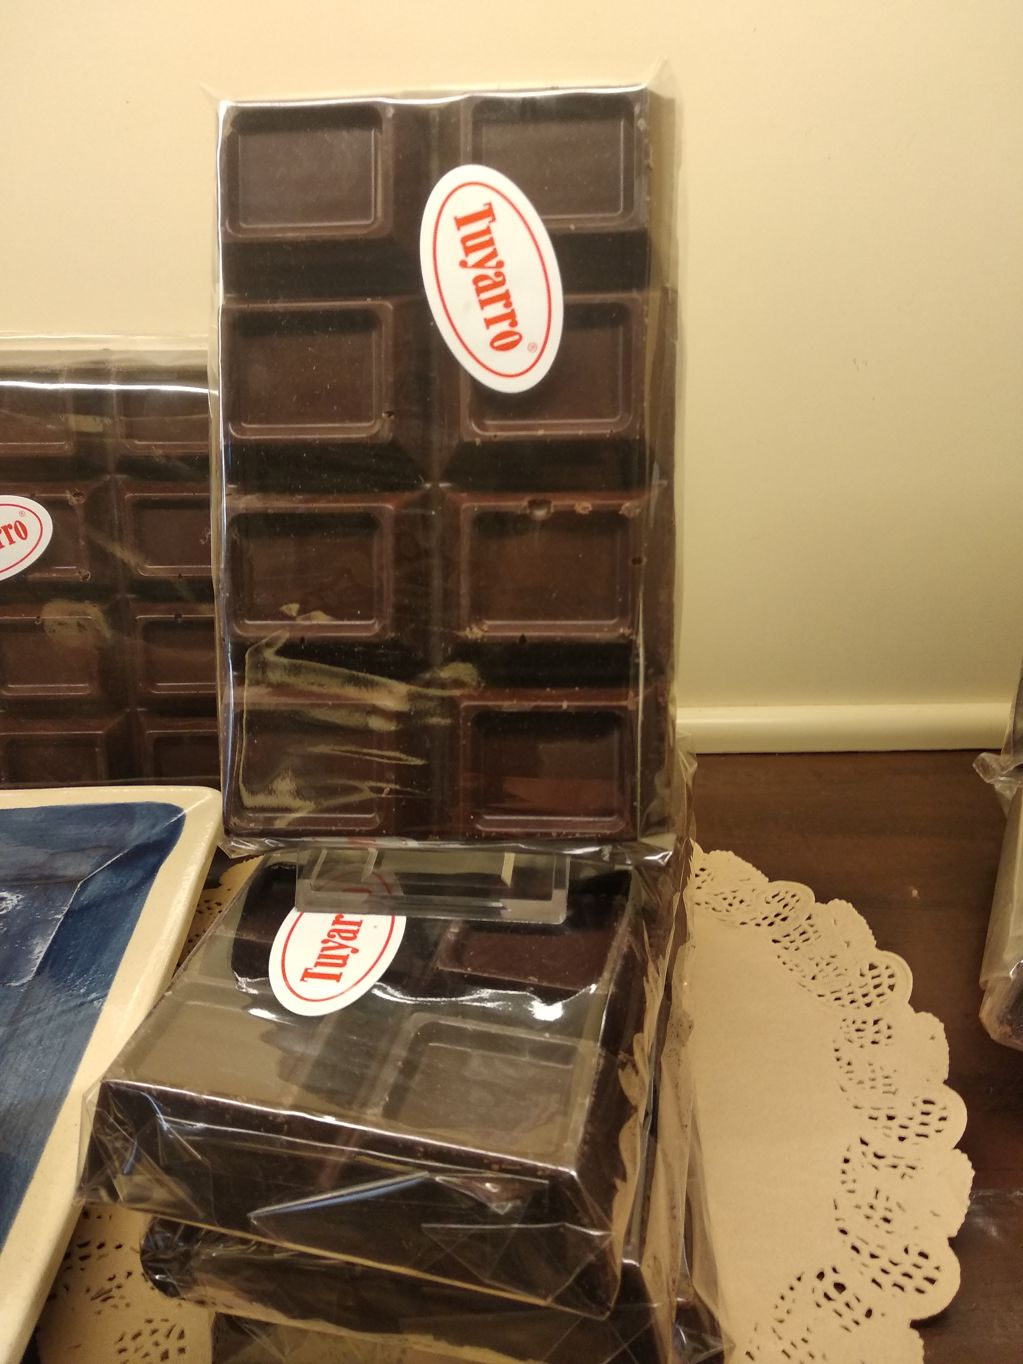 Chocolate cobertura 400 gr - adf9b-IMG_20200901_100334_i440.jpg